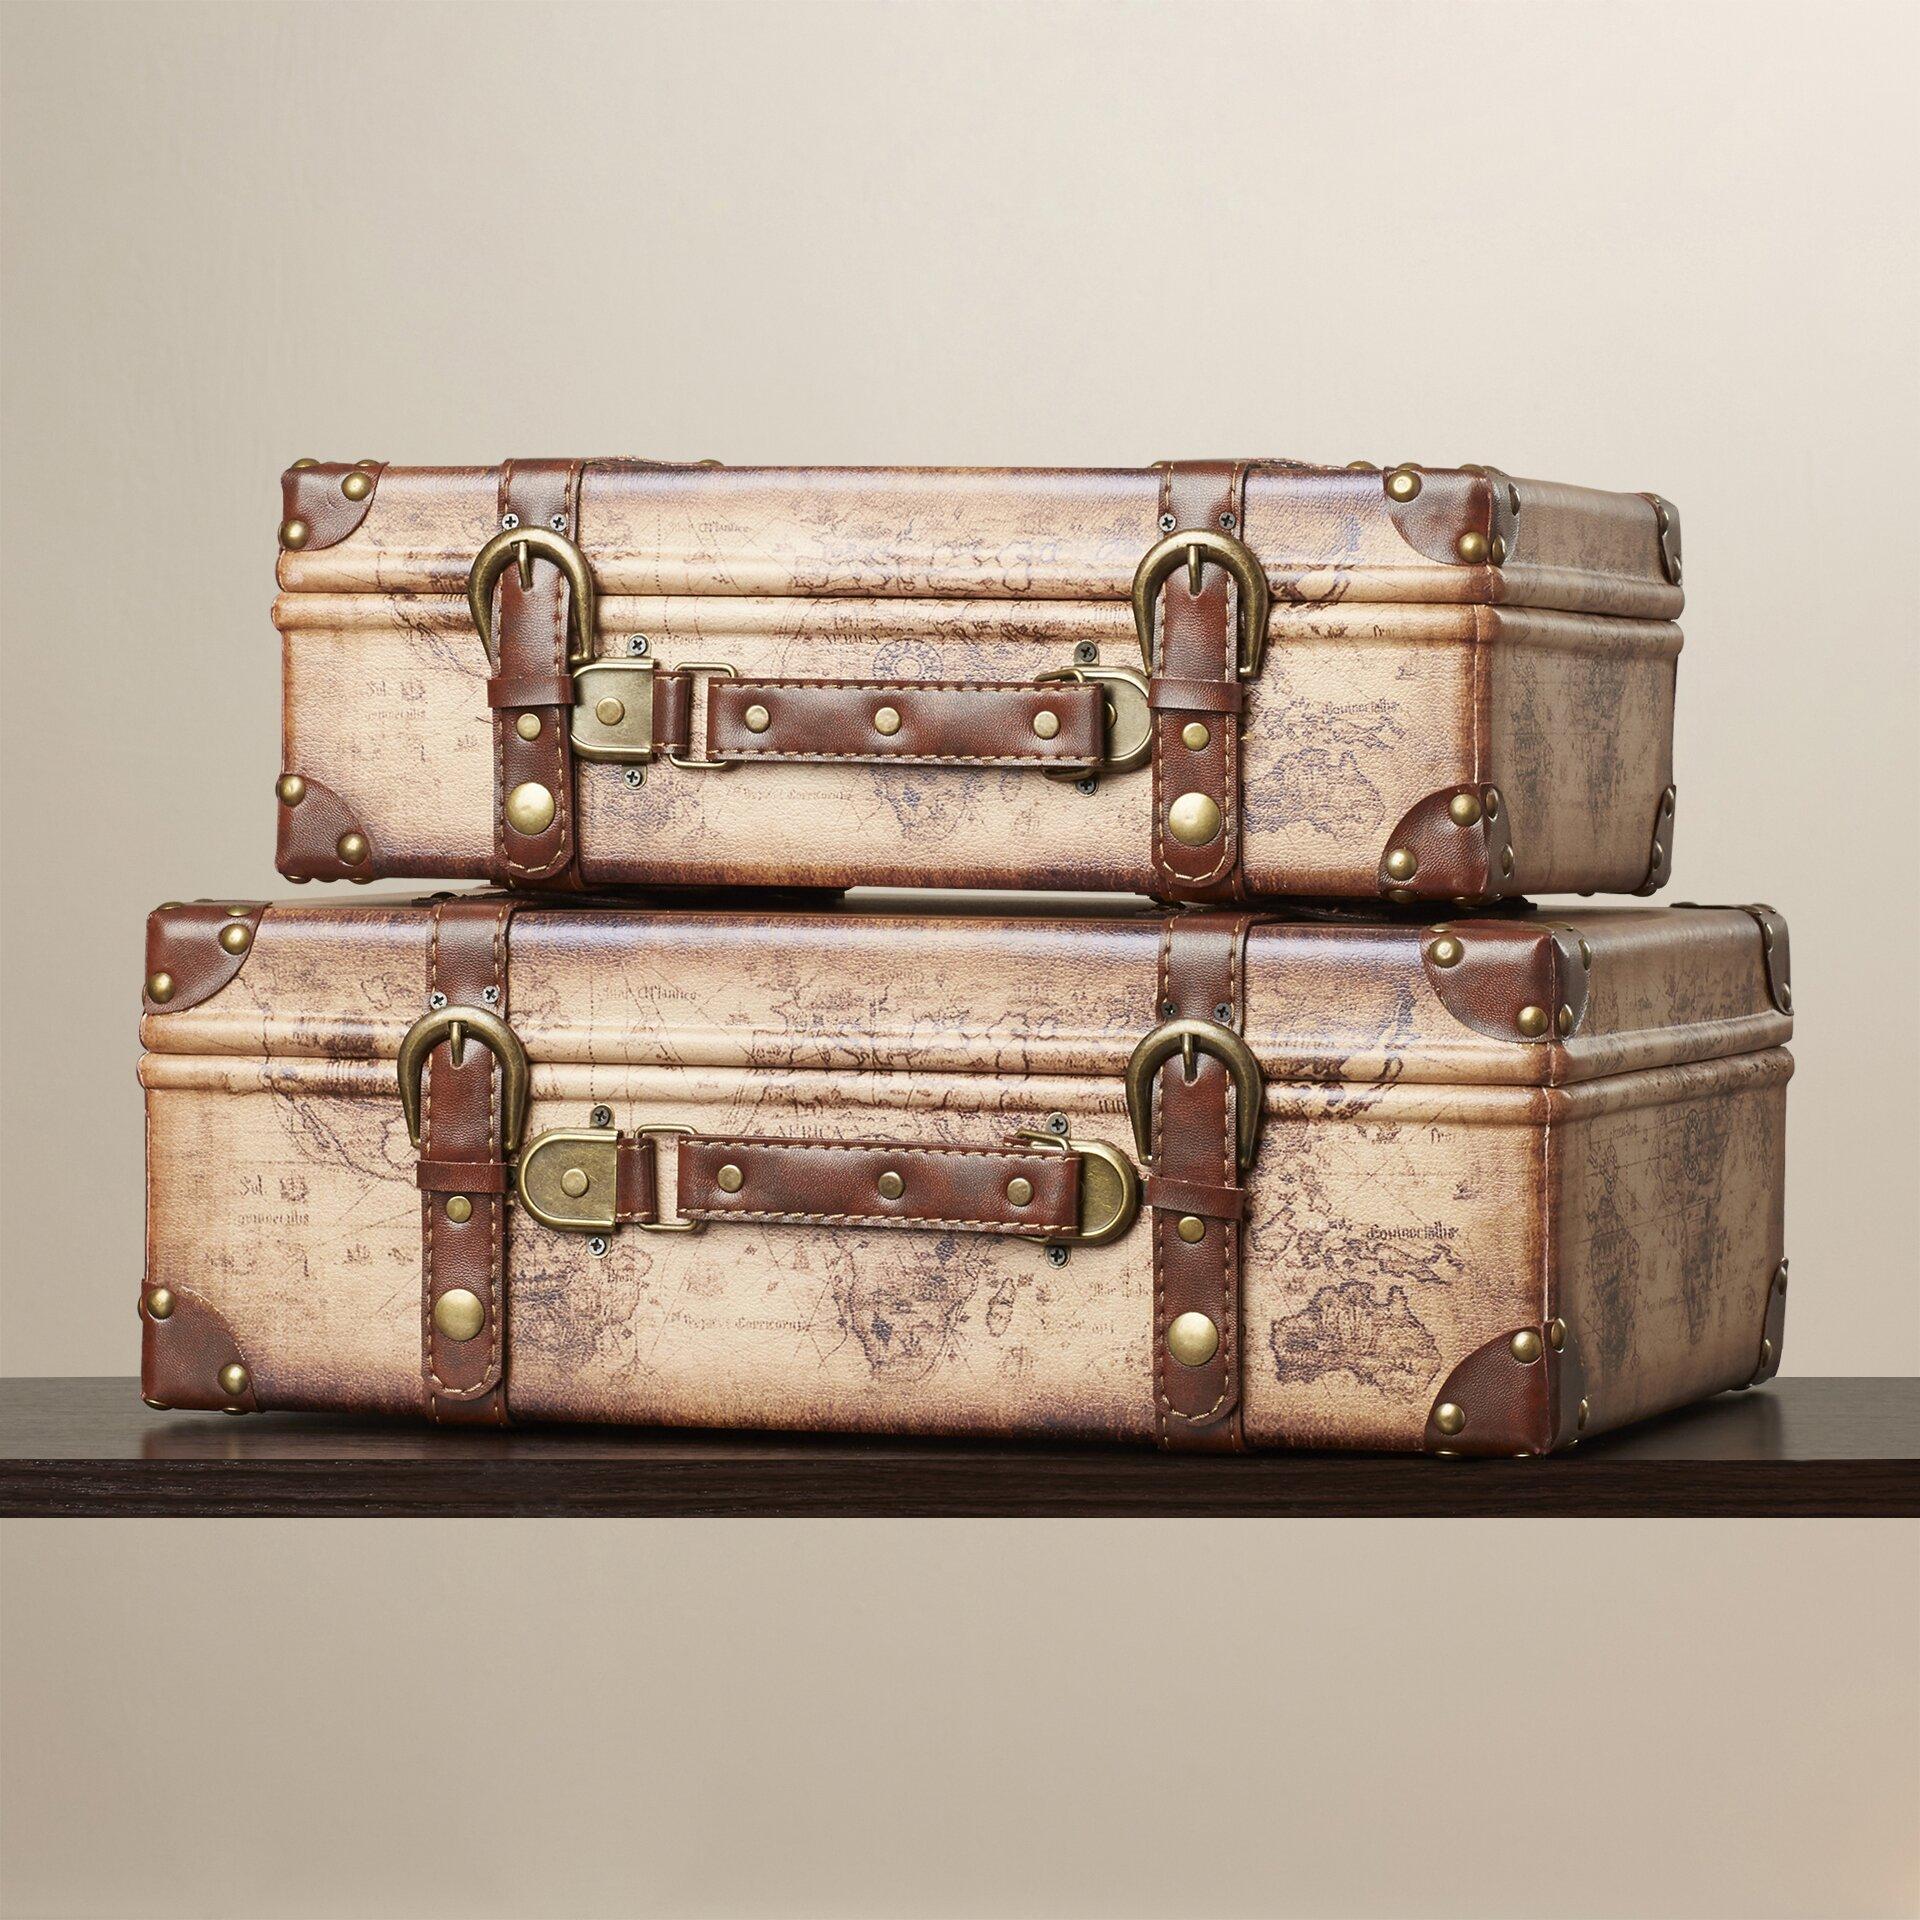 Luggage Style Furniture Vintage S Blue Samsonite Suitcase Luggage